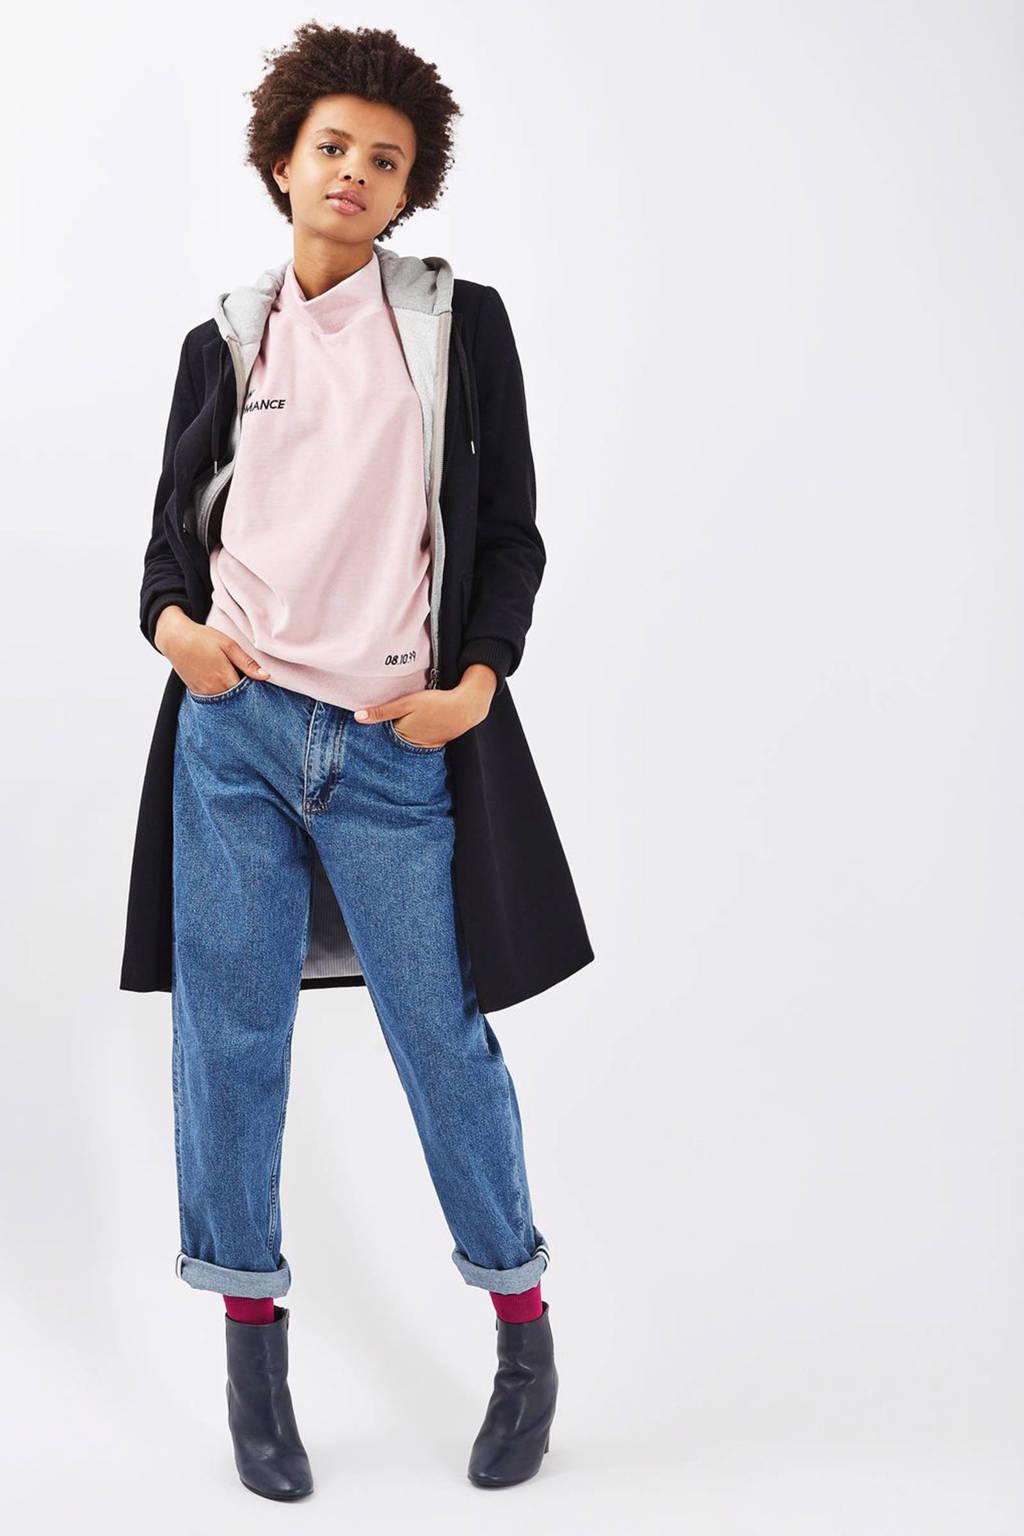 Topshop sweater, Roze